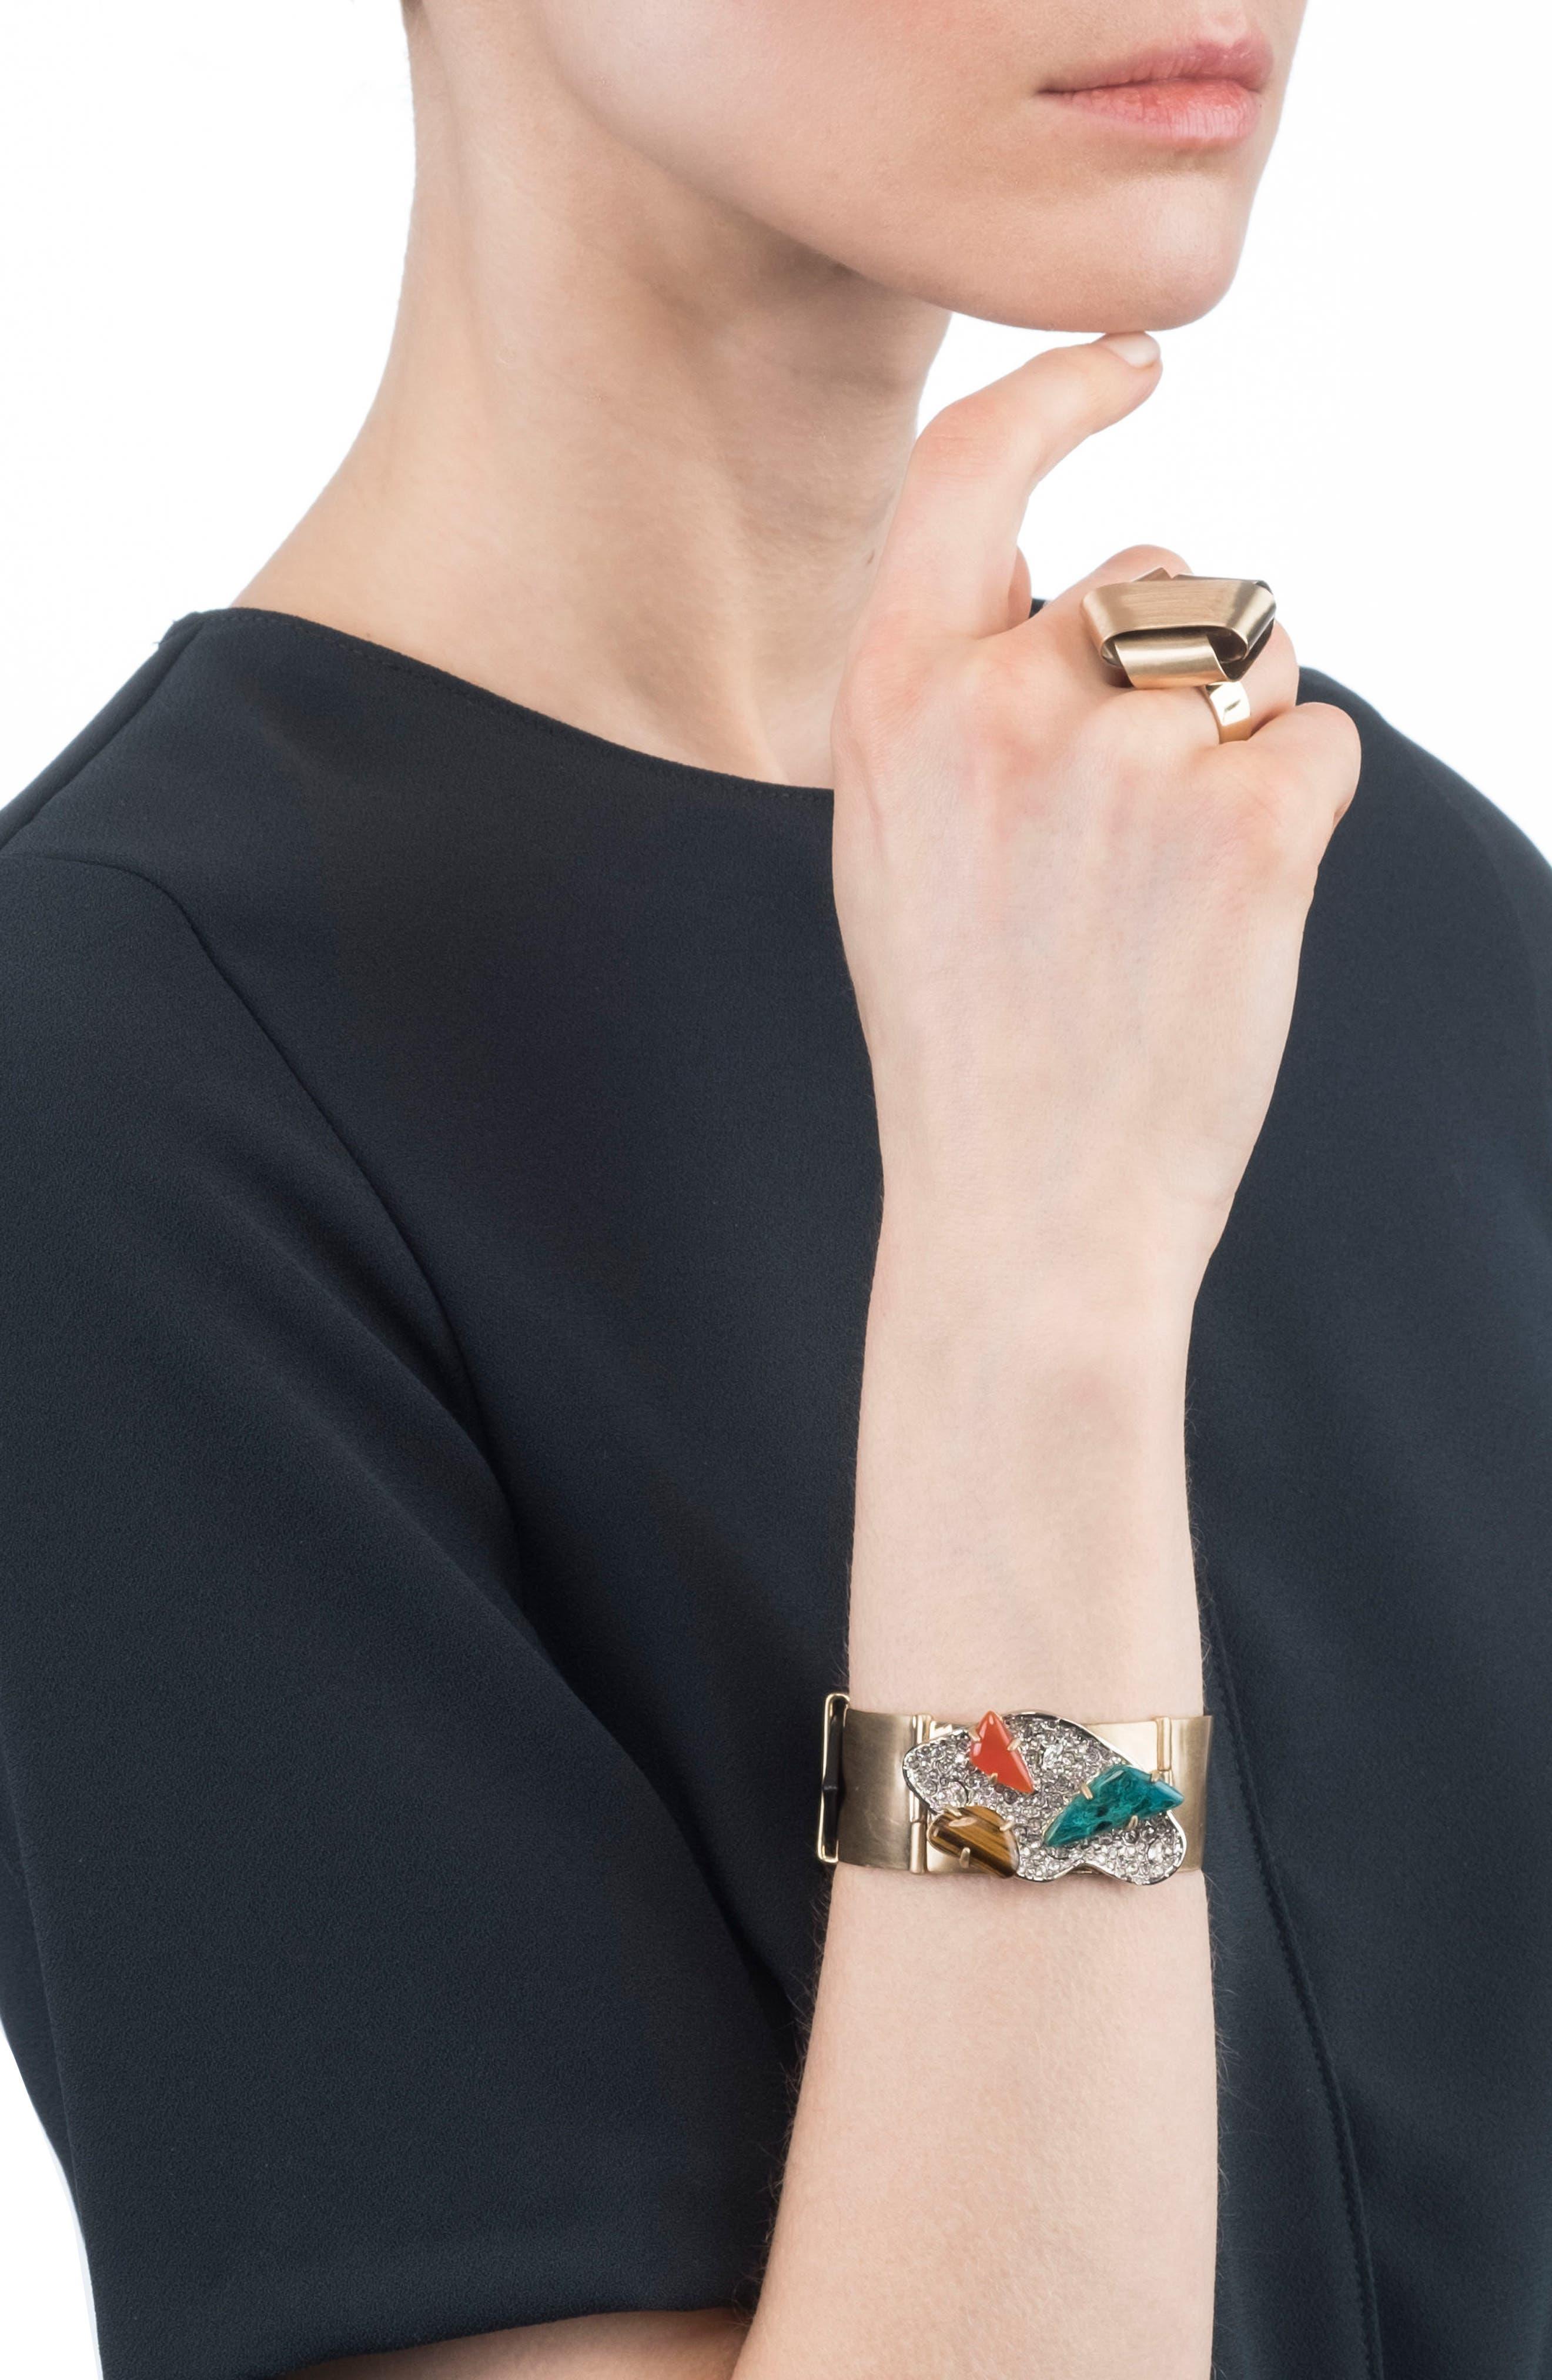 Crystal Encrusted Leather Strap Bracelet,                             Alternate thumbnail 2, color,                             GOLD/ SILVER